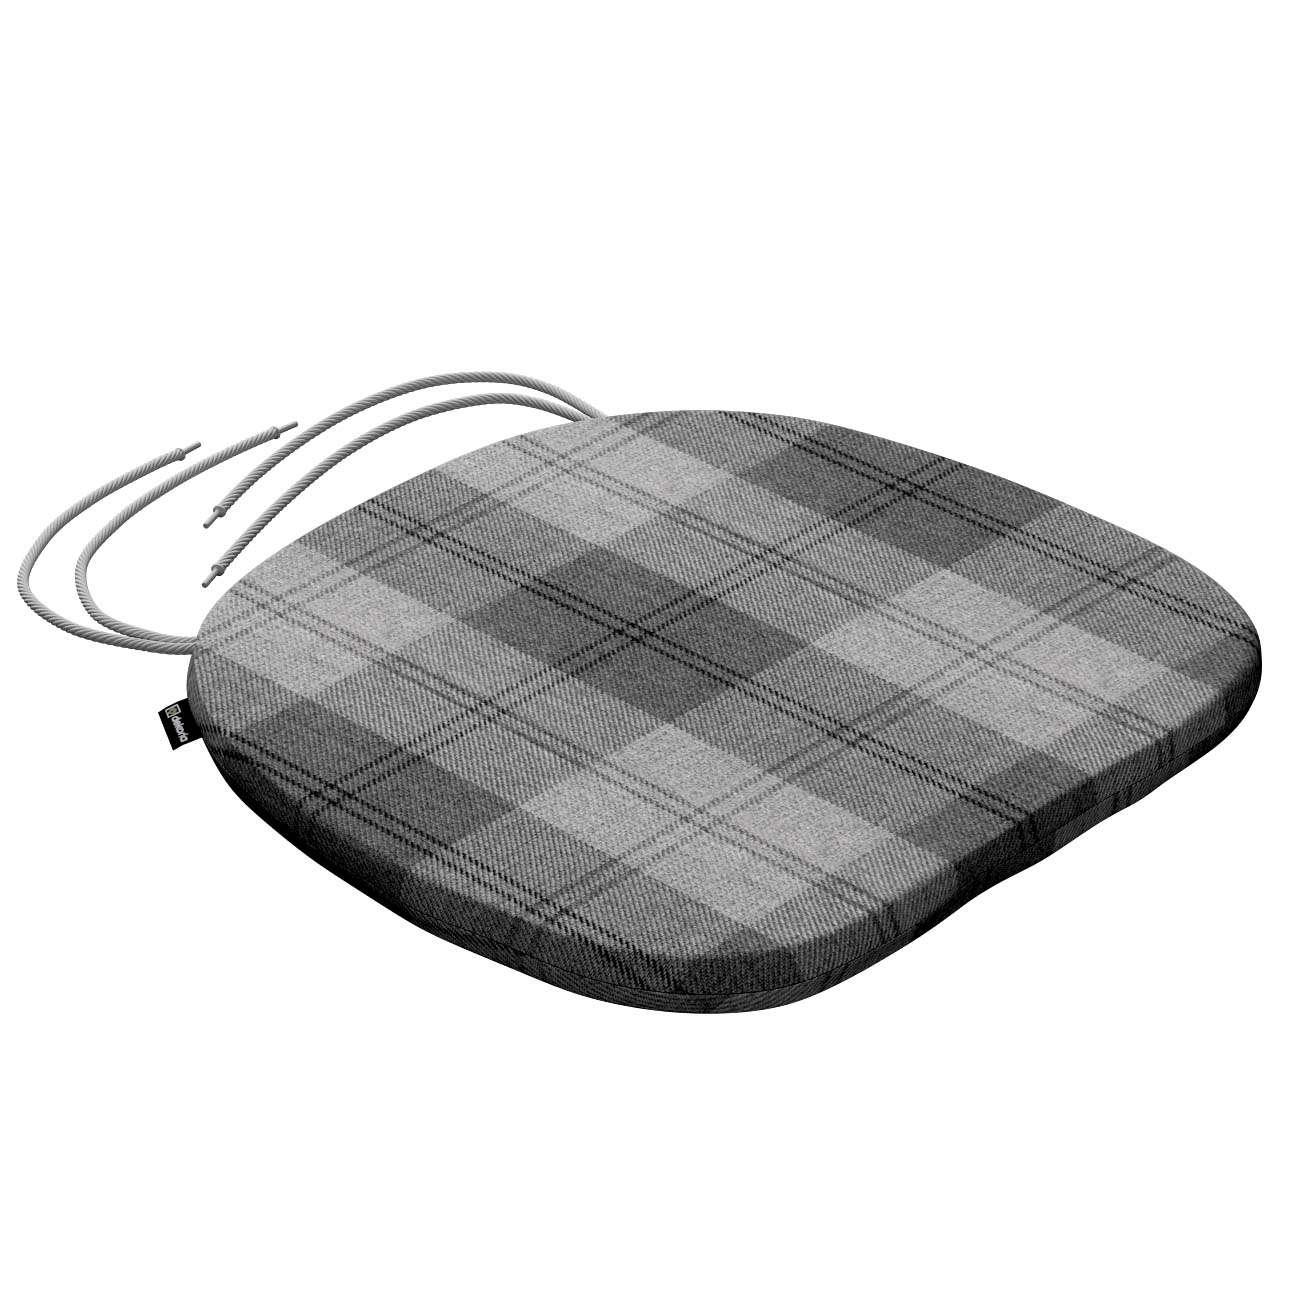 Stolehynde Marcus fra kollektionen Edinburgh, Stof: 115-75